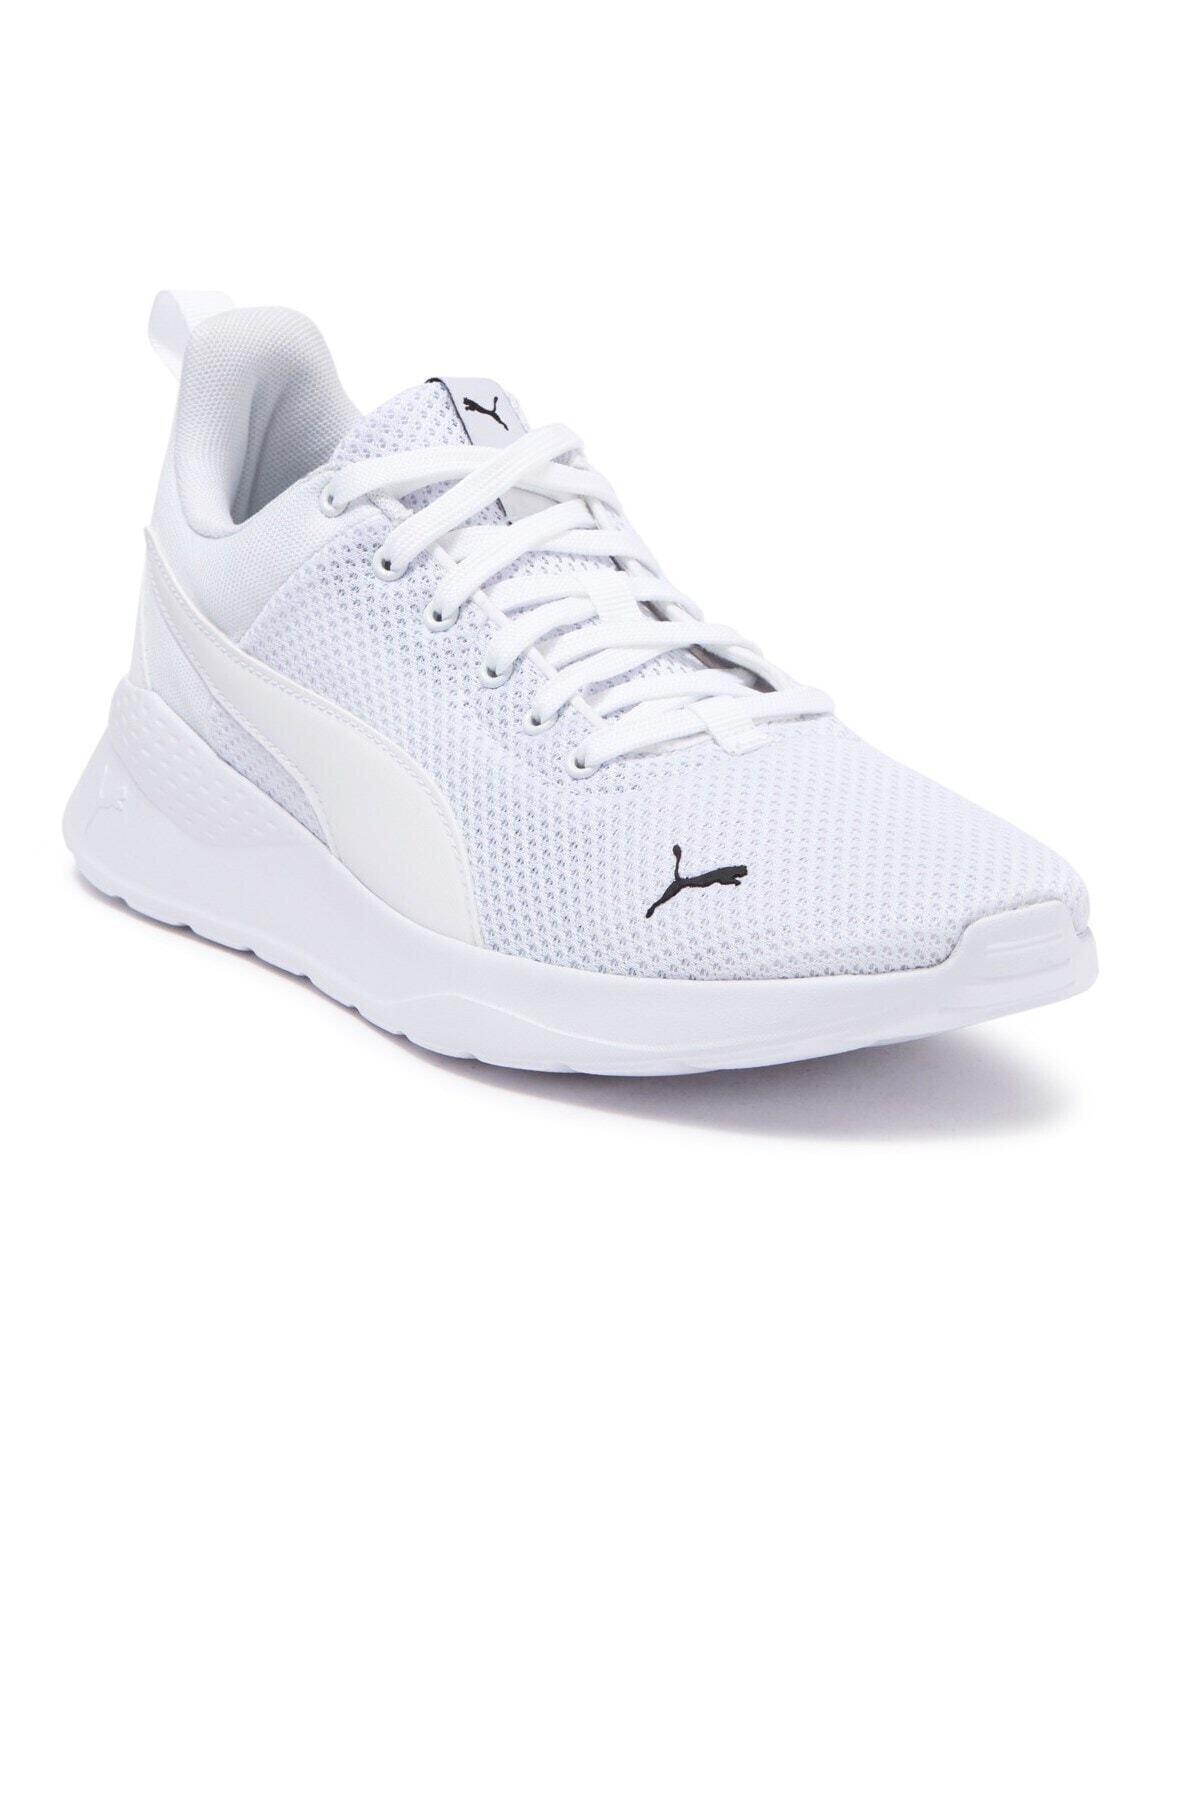 Puma ANZARUN LITE Beyaz Erkek Sneaker Ayakkabı 100547144 1